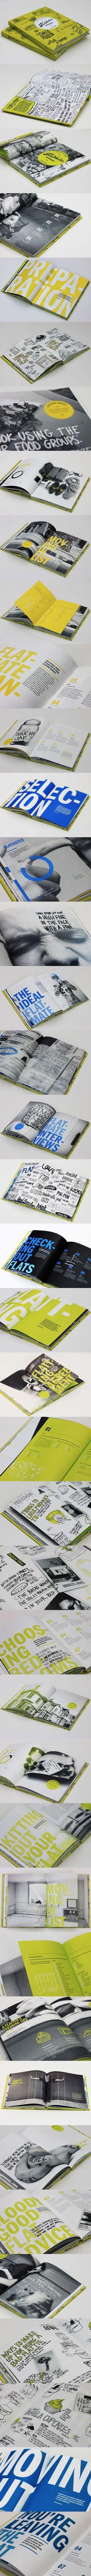 Flatmates Handbook in Layouts/Editorial Layout Print, Layout Design, Design De Configuration, Graphic Design Layouts, Graphic Design Typography, Web Design, Print Design, Editorial Design Layouts, Mises En Page Design Graphique